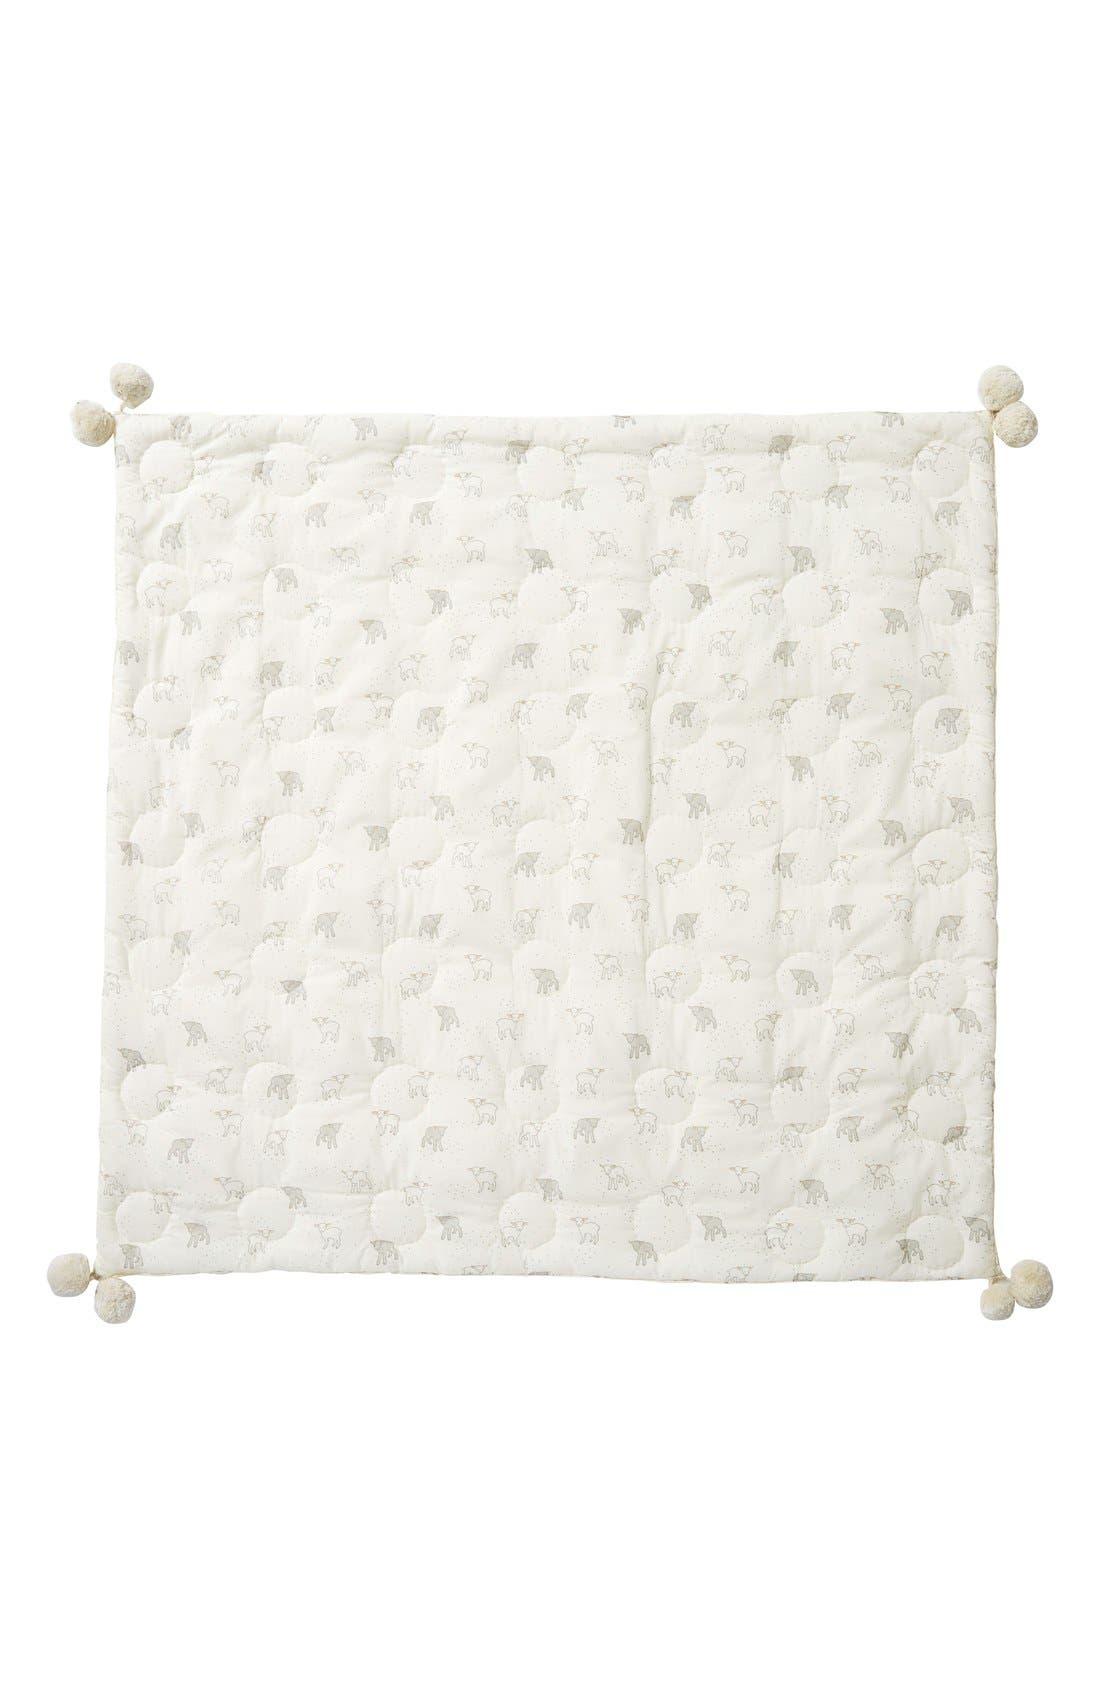 Little Lamb Baby Blanket,                             Main thumbnail 1, color,                             Cream